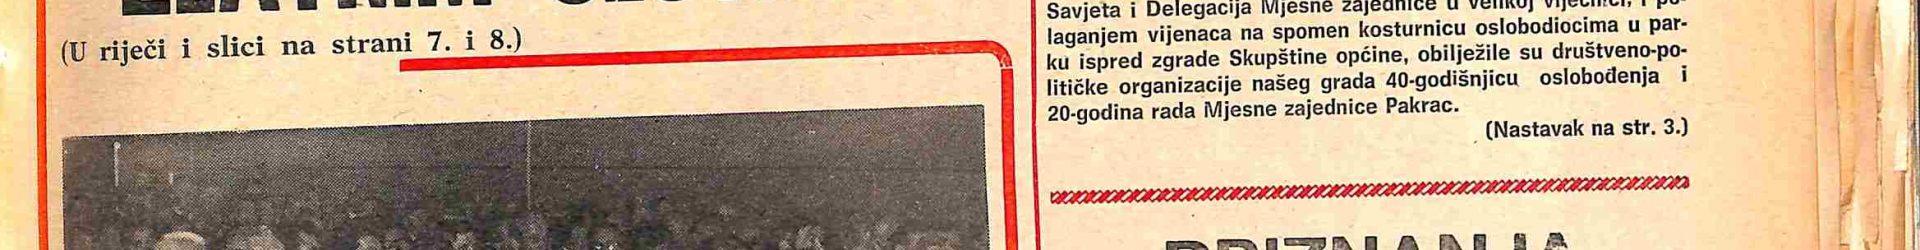 12 listopada 1984_Page_01